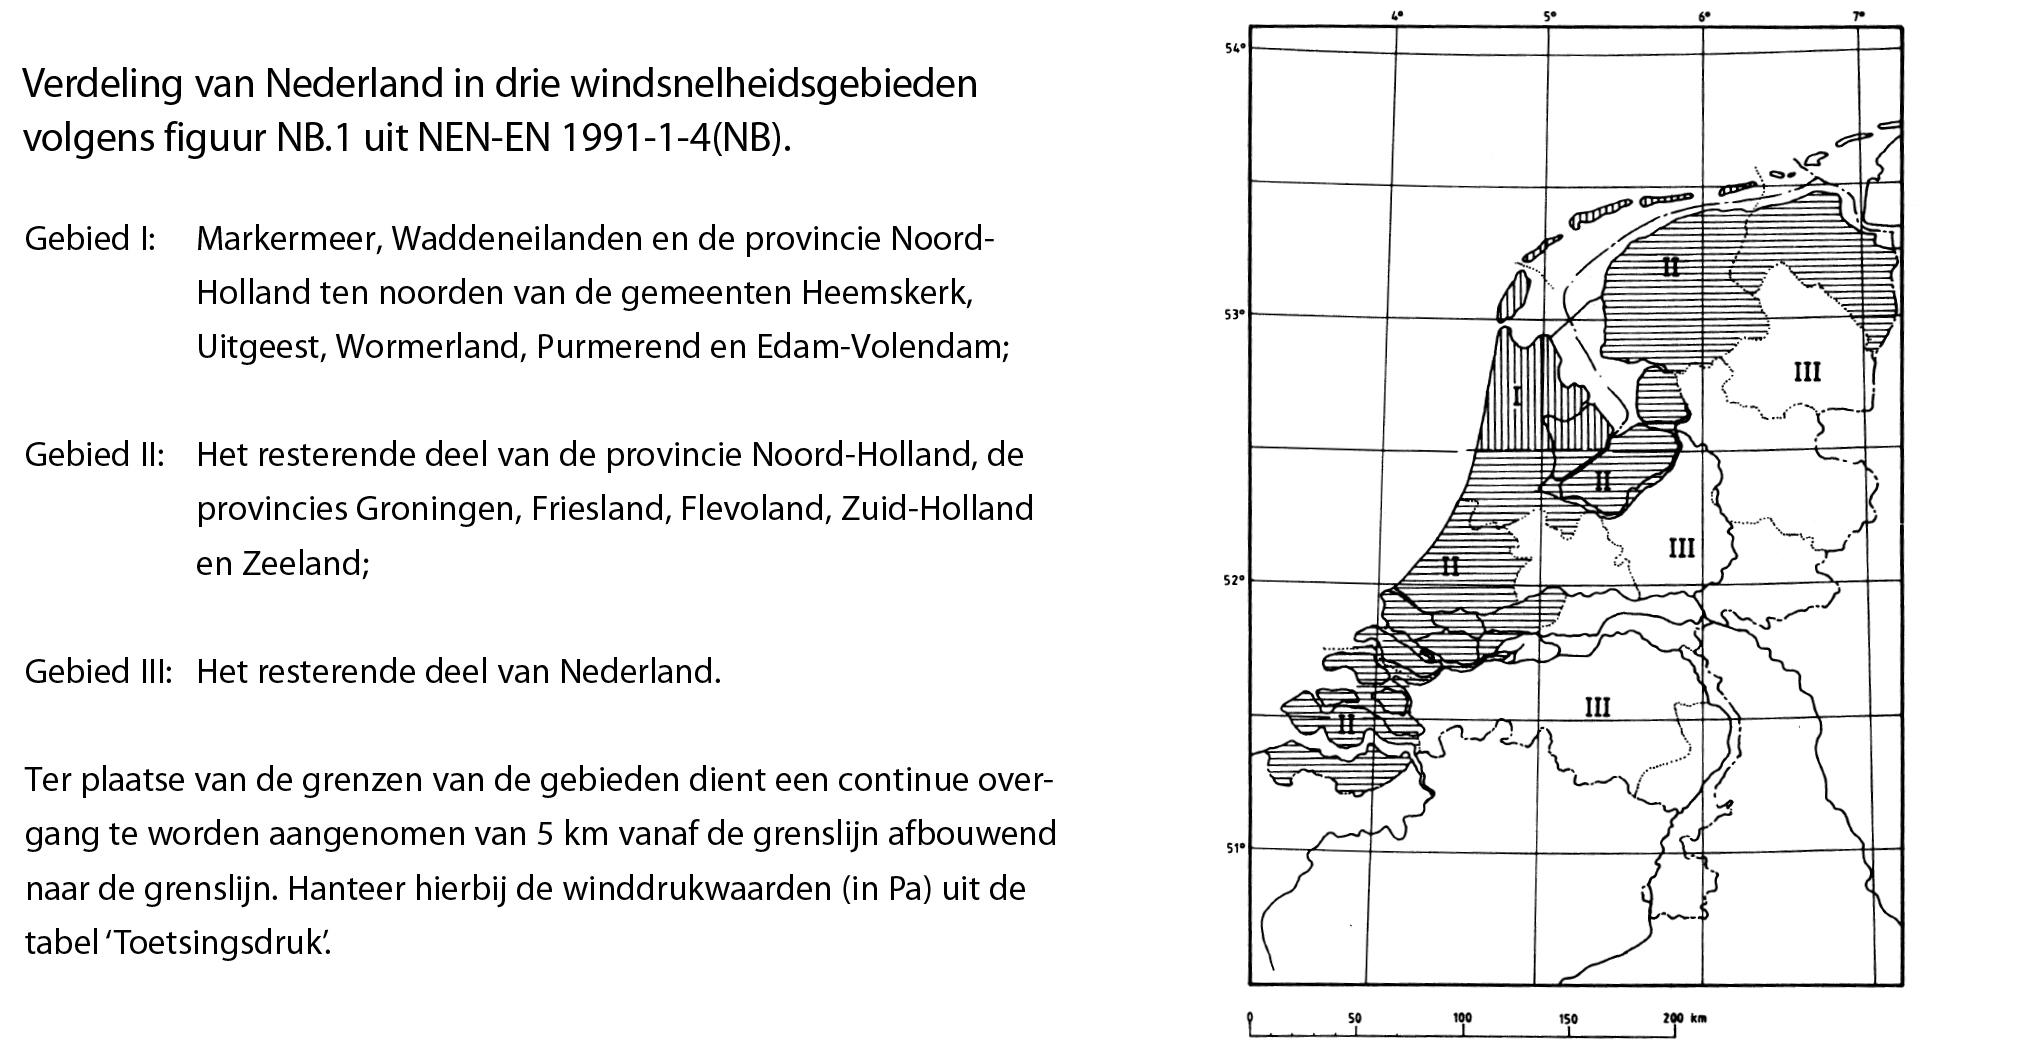 11.4.3 Aluminium_Functionele-Eisen_Luchtdoorlatendheid_Vliesgevels_WindsnelheidsgebiedenNL.jpg